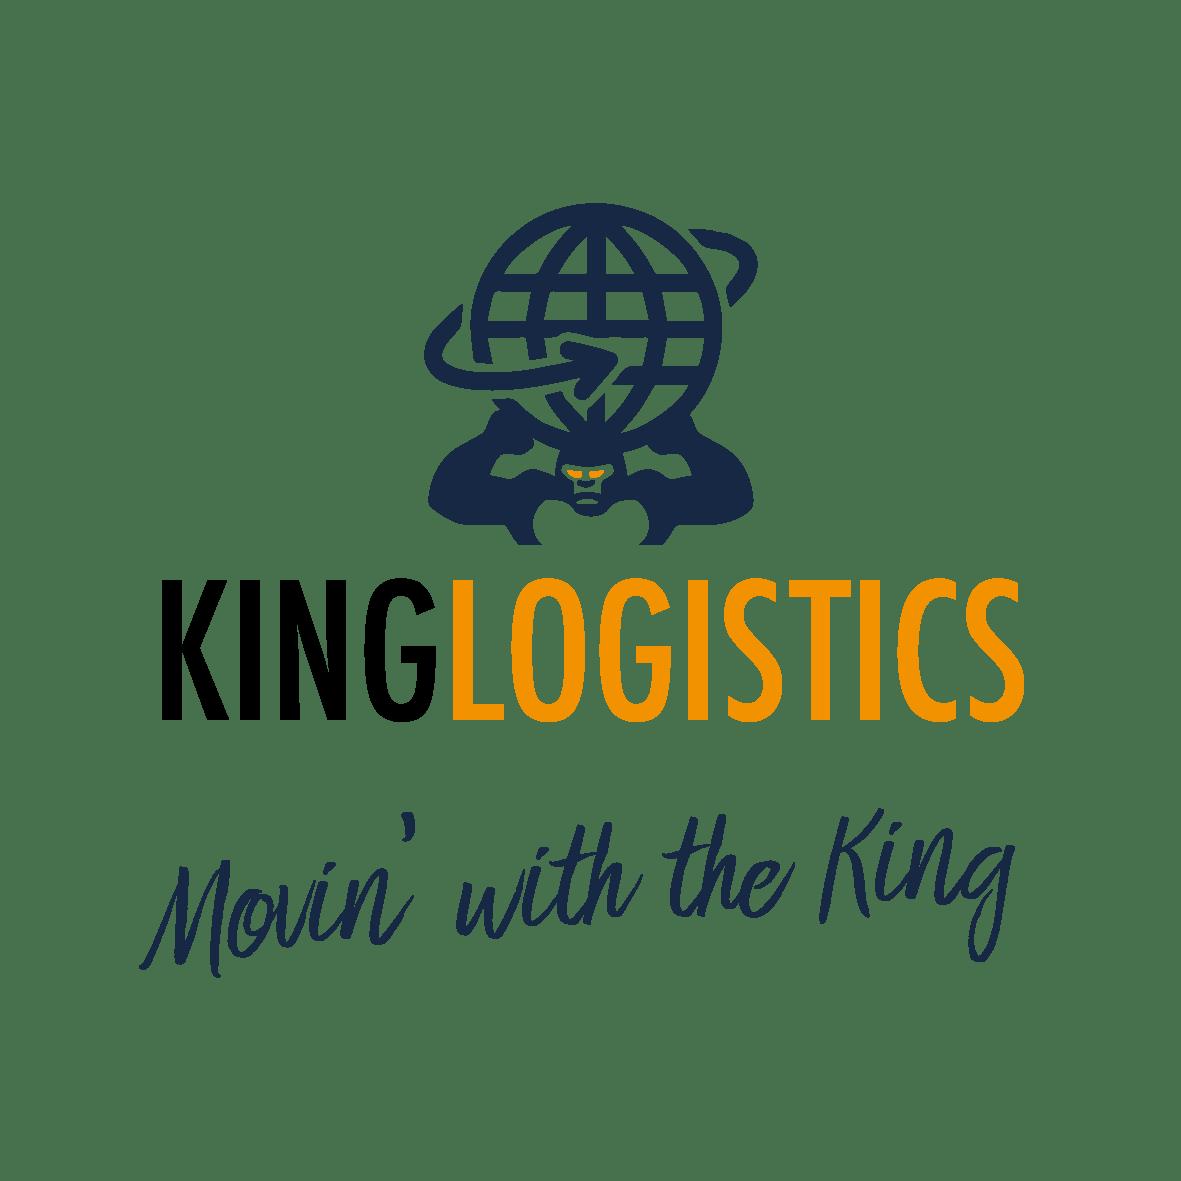 King Logistics